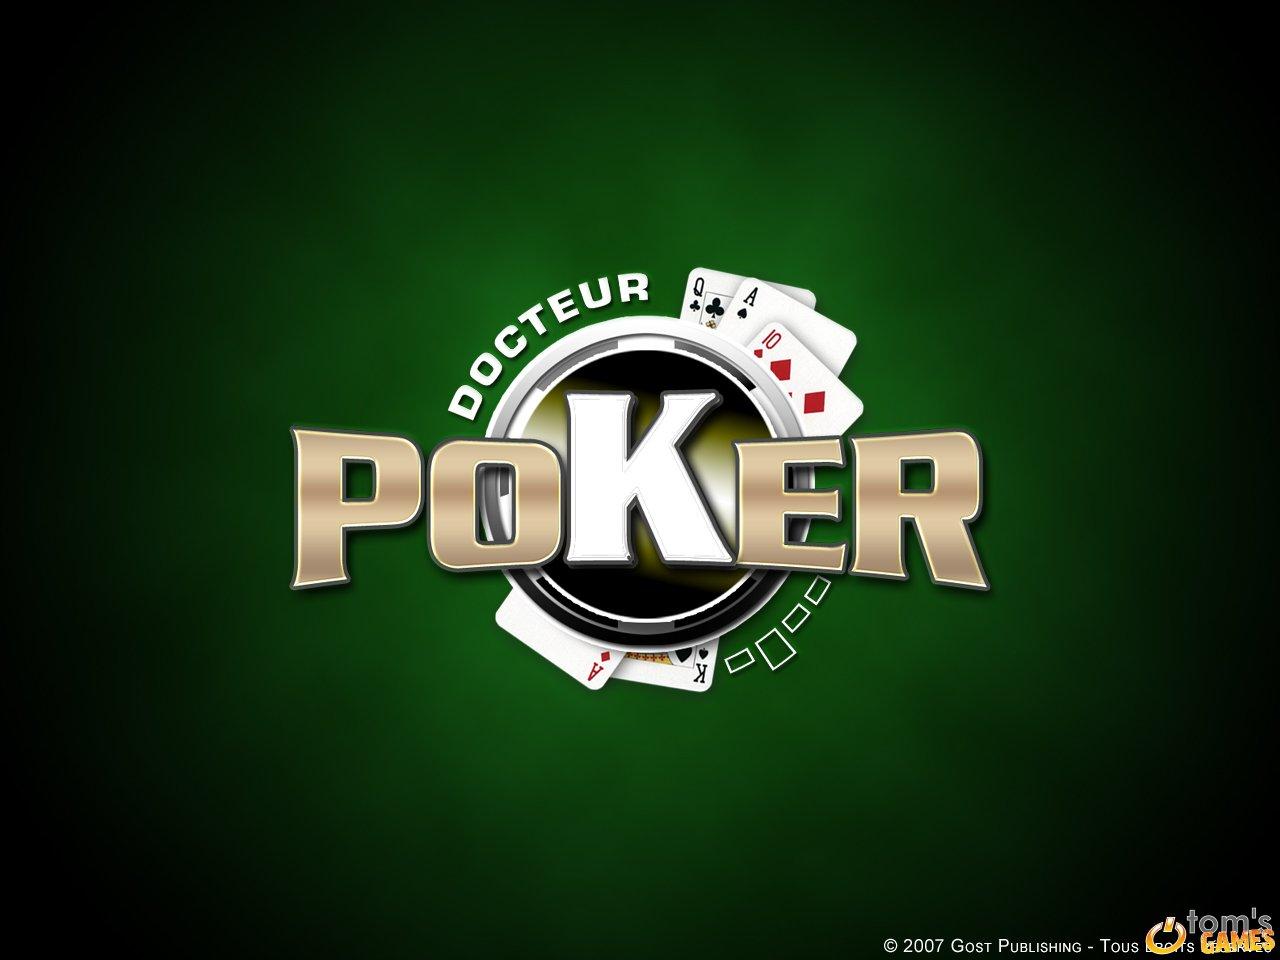 Wallpapers Poker Et Fond D Ecran De Poker